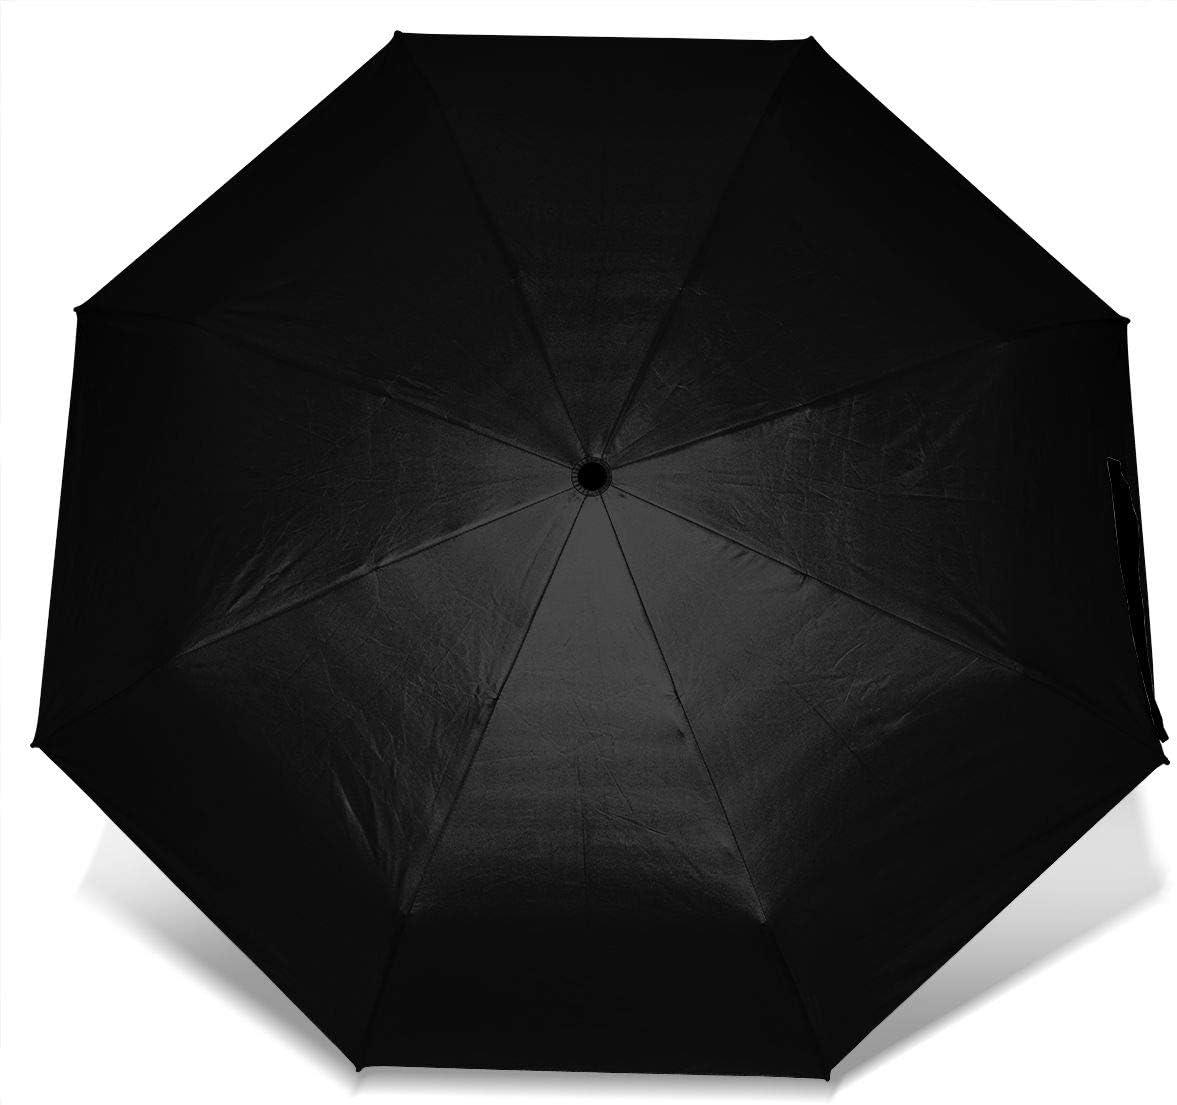 Lovesofun Portable Manual Umbrella Toron-to Maple Leafs Compact Folding Business Umbrellas UV Protection Manual Tri-fold Umbrella for Men and Women